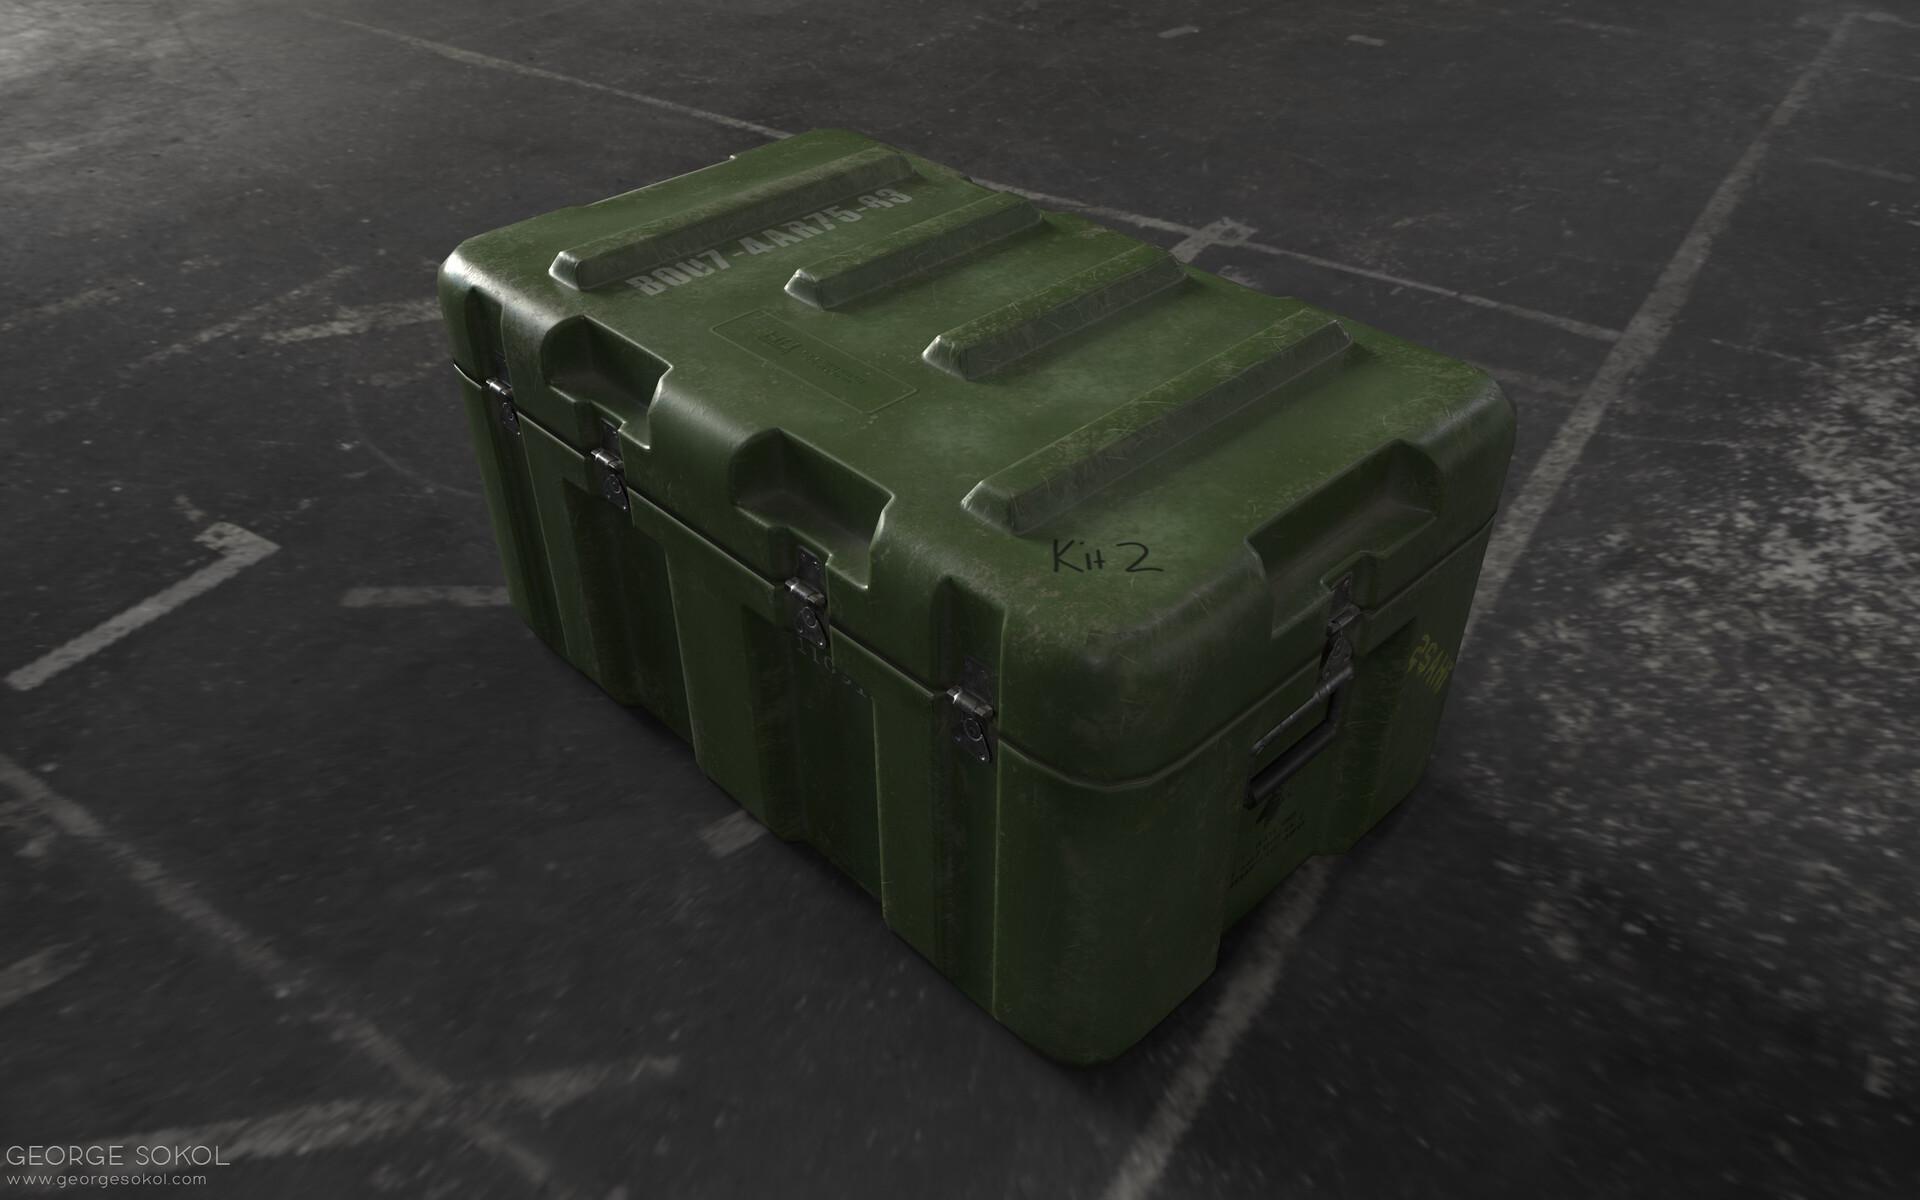 George sokol gs crate 2